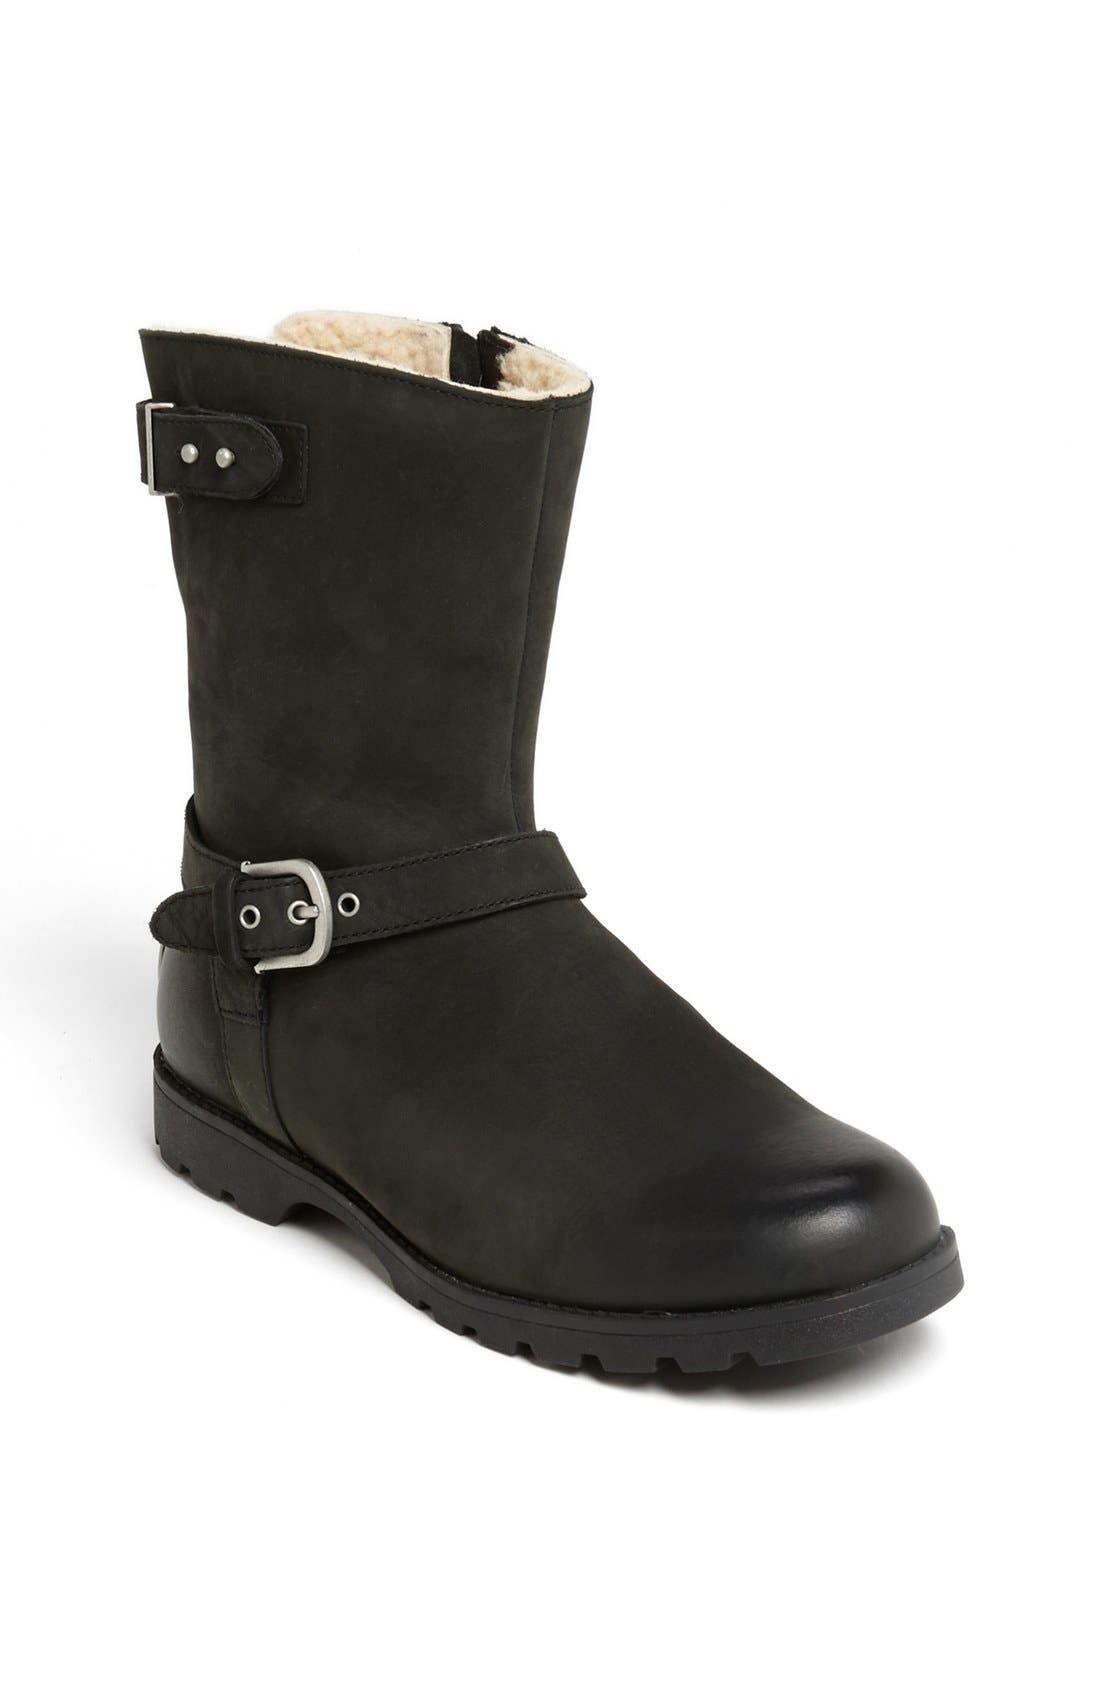 UGG<SUP>®</SUP> Australia 'Grandle' Boot, Main, color, 001